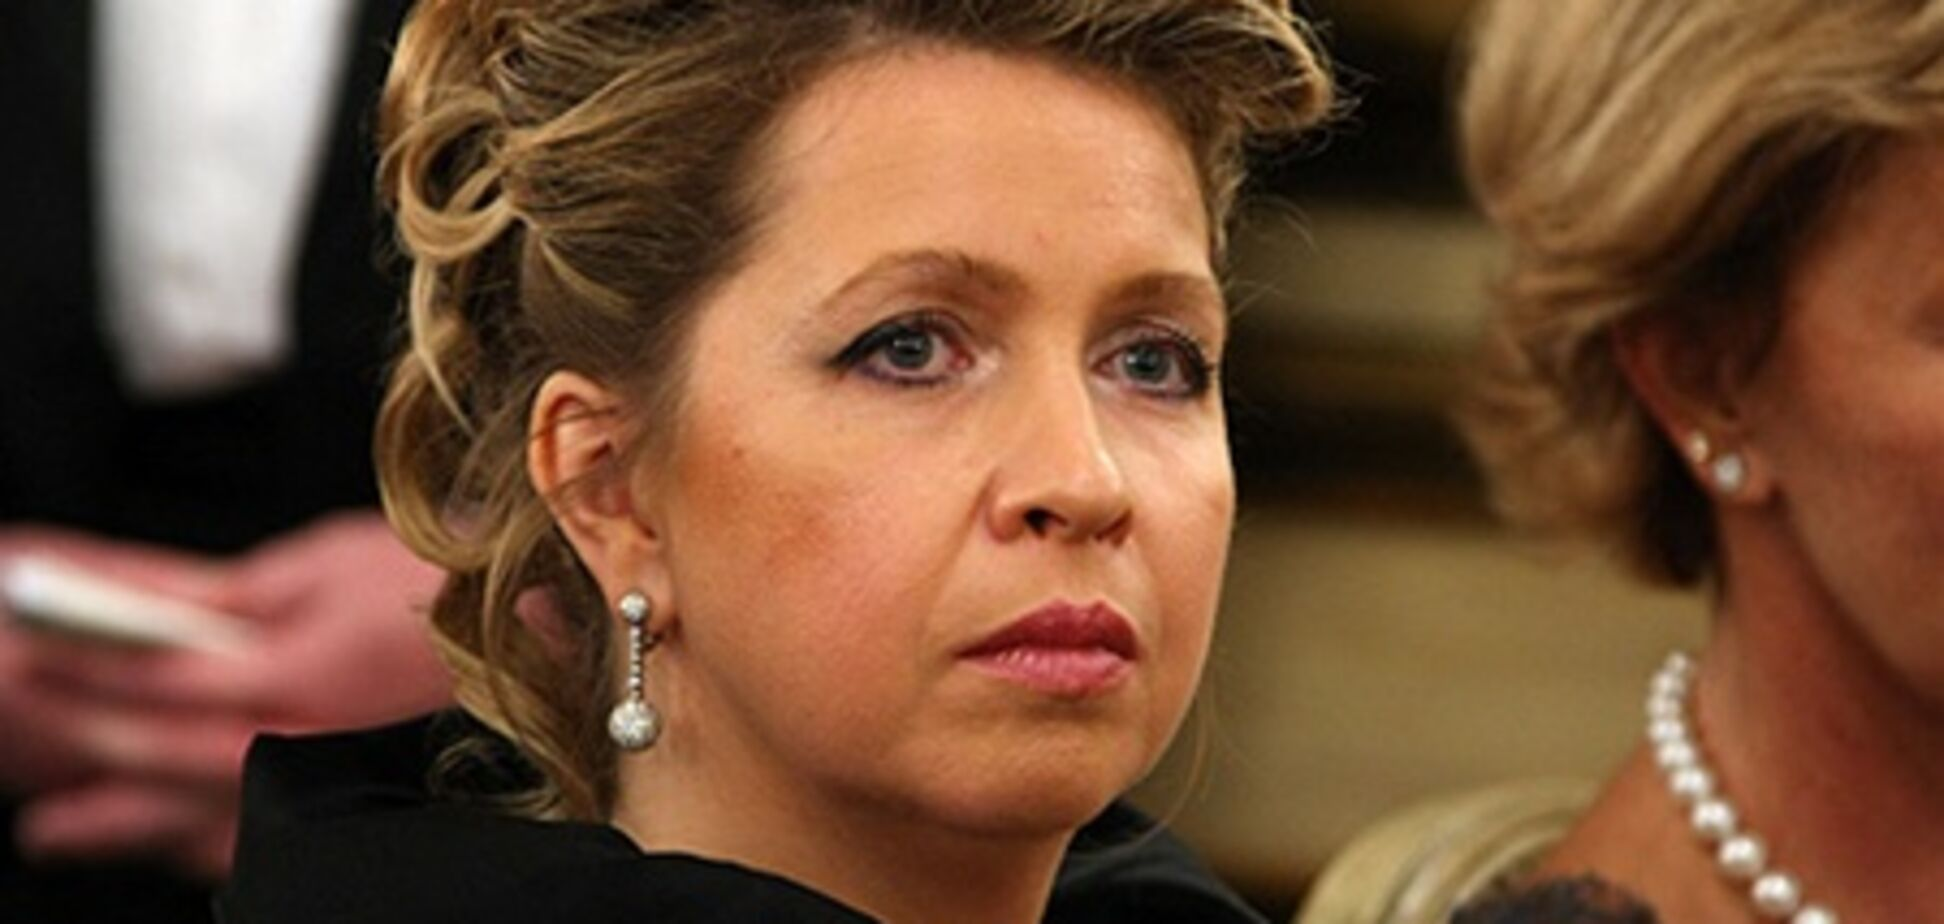 Дружина Медведєва втрапила у скандал: влада РФ зробила заяву через 'родичів'